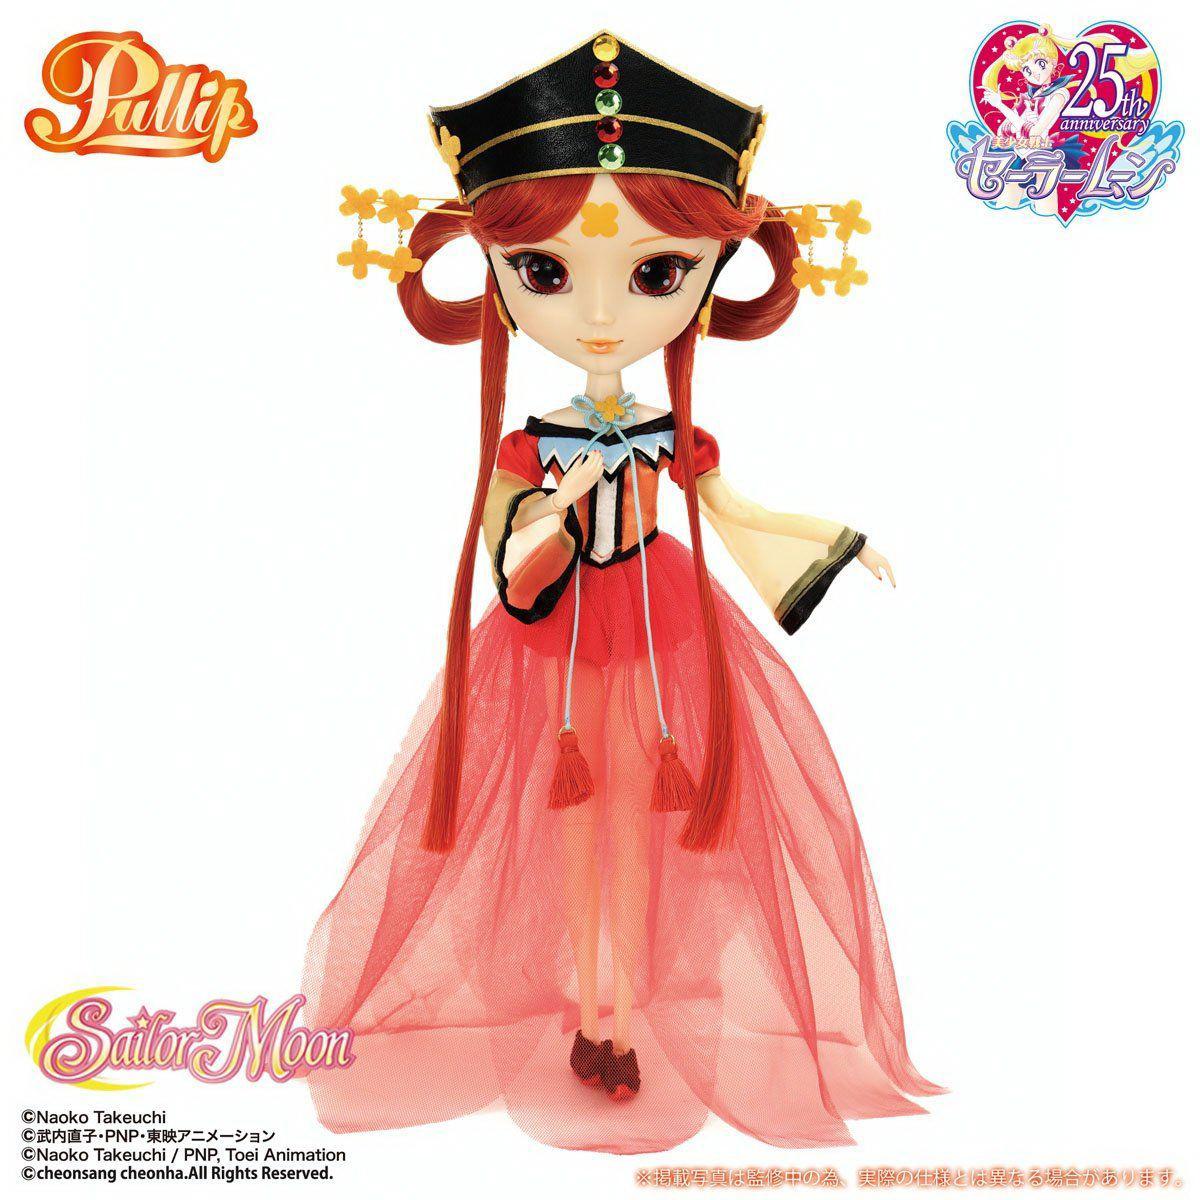 PROPLICA Sailor Moon CUTIE MOON ROD Costume BANDAI Japan Action Figure NEW!!